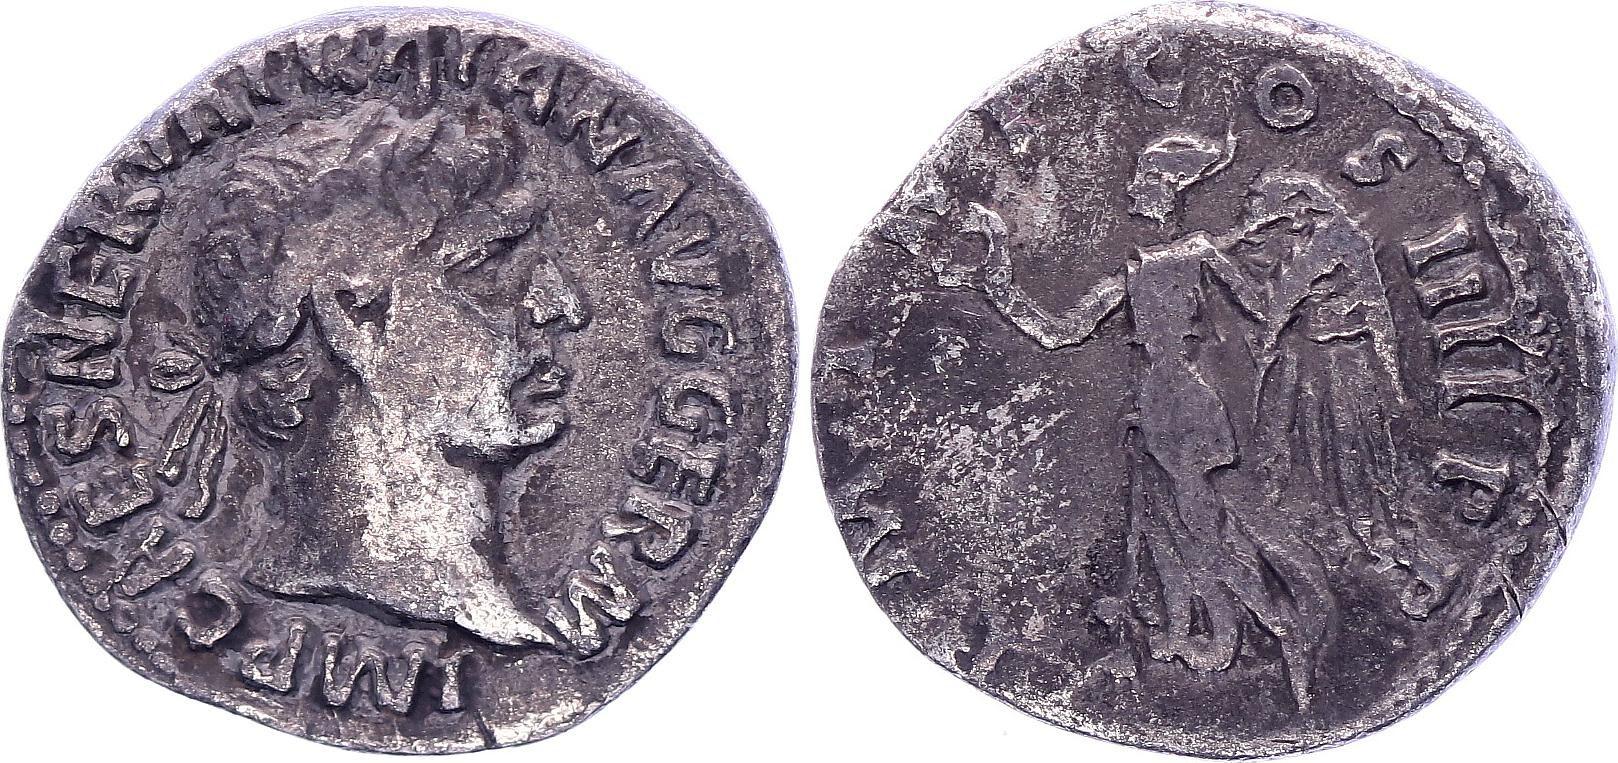 Rome Empire Denier, Trajan - 103-111 Rome